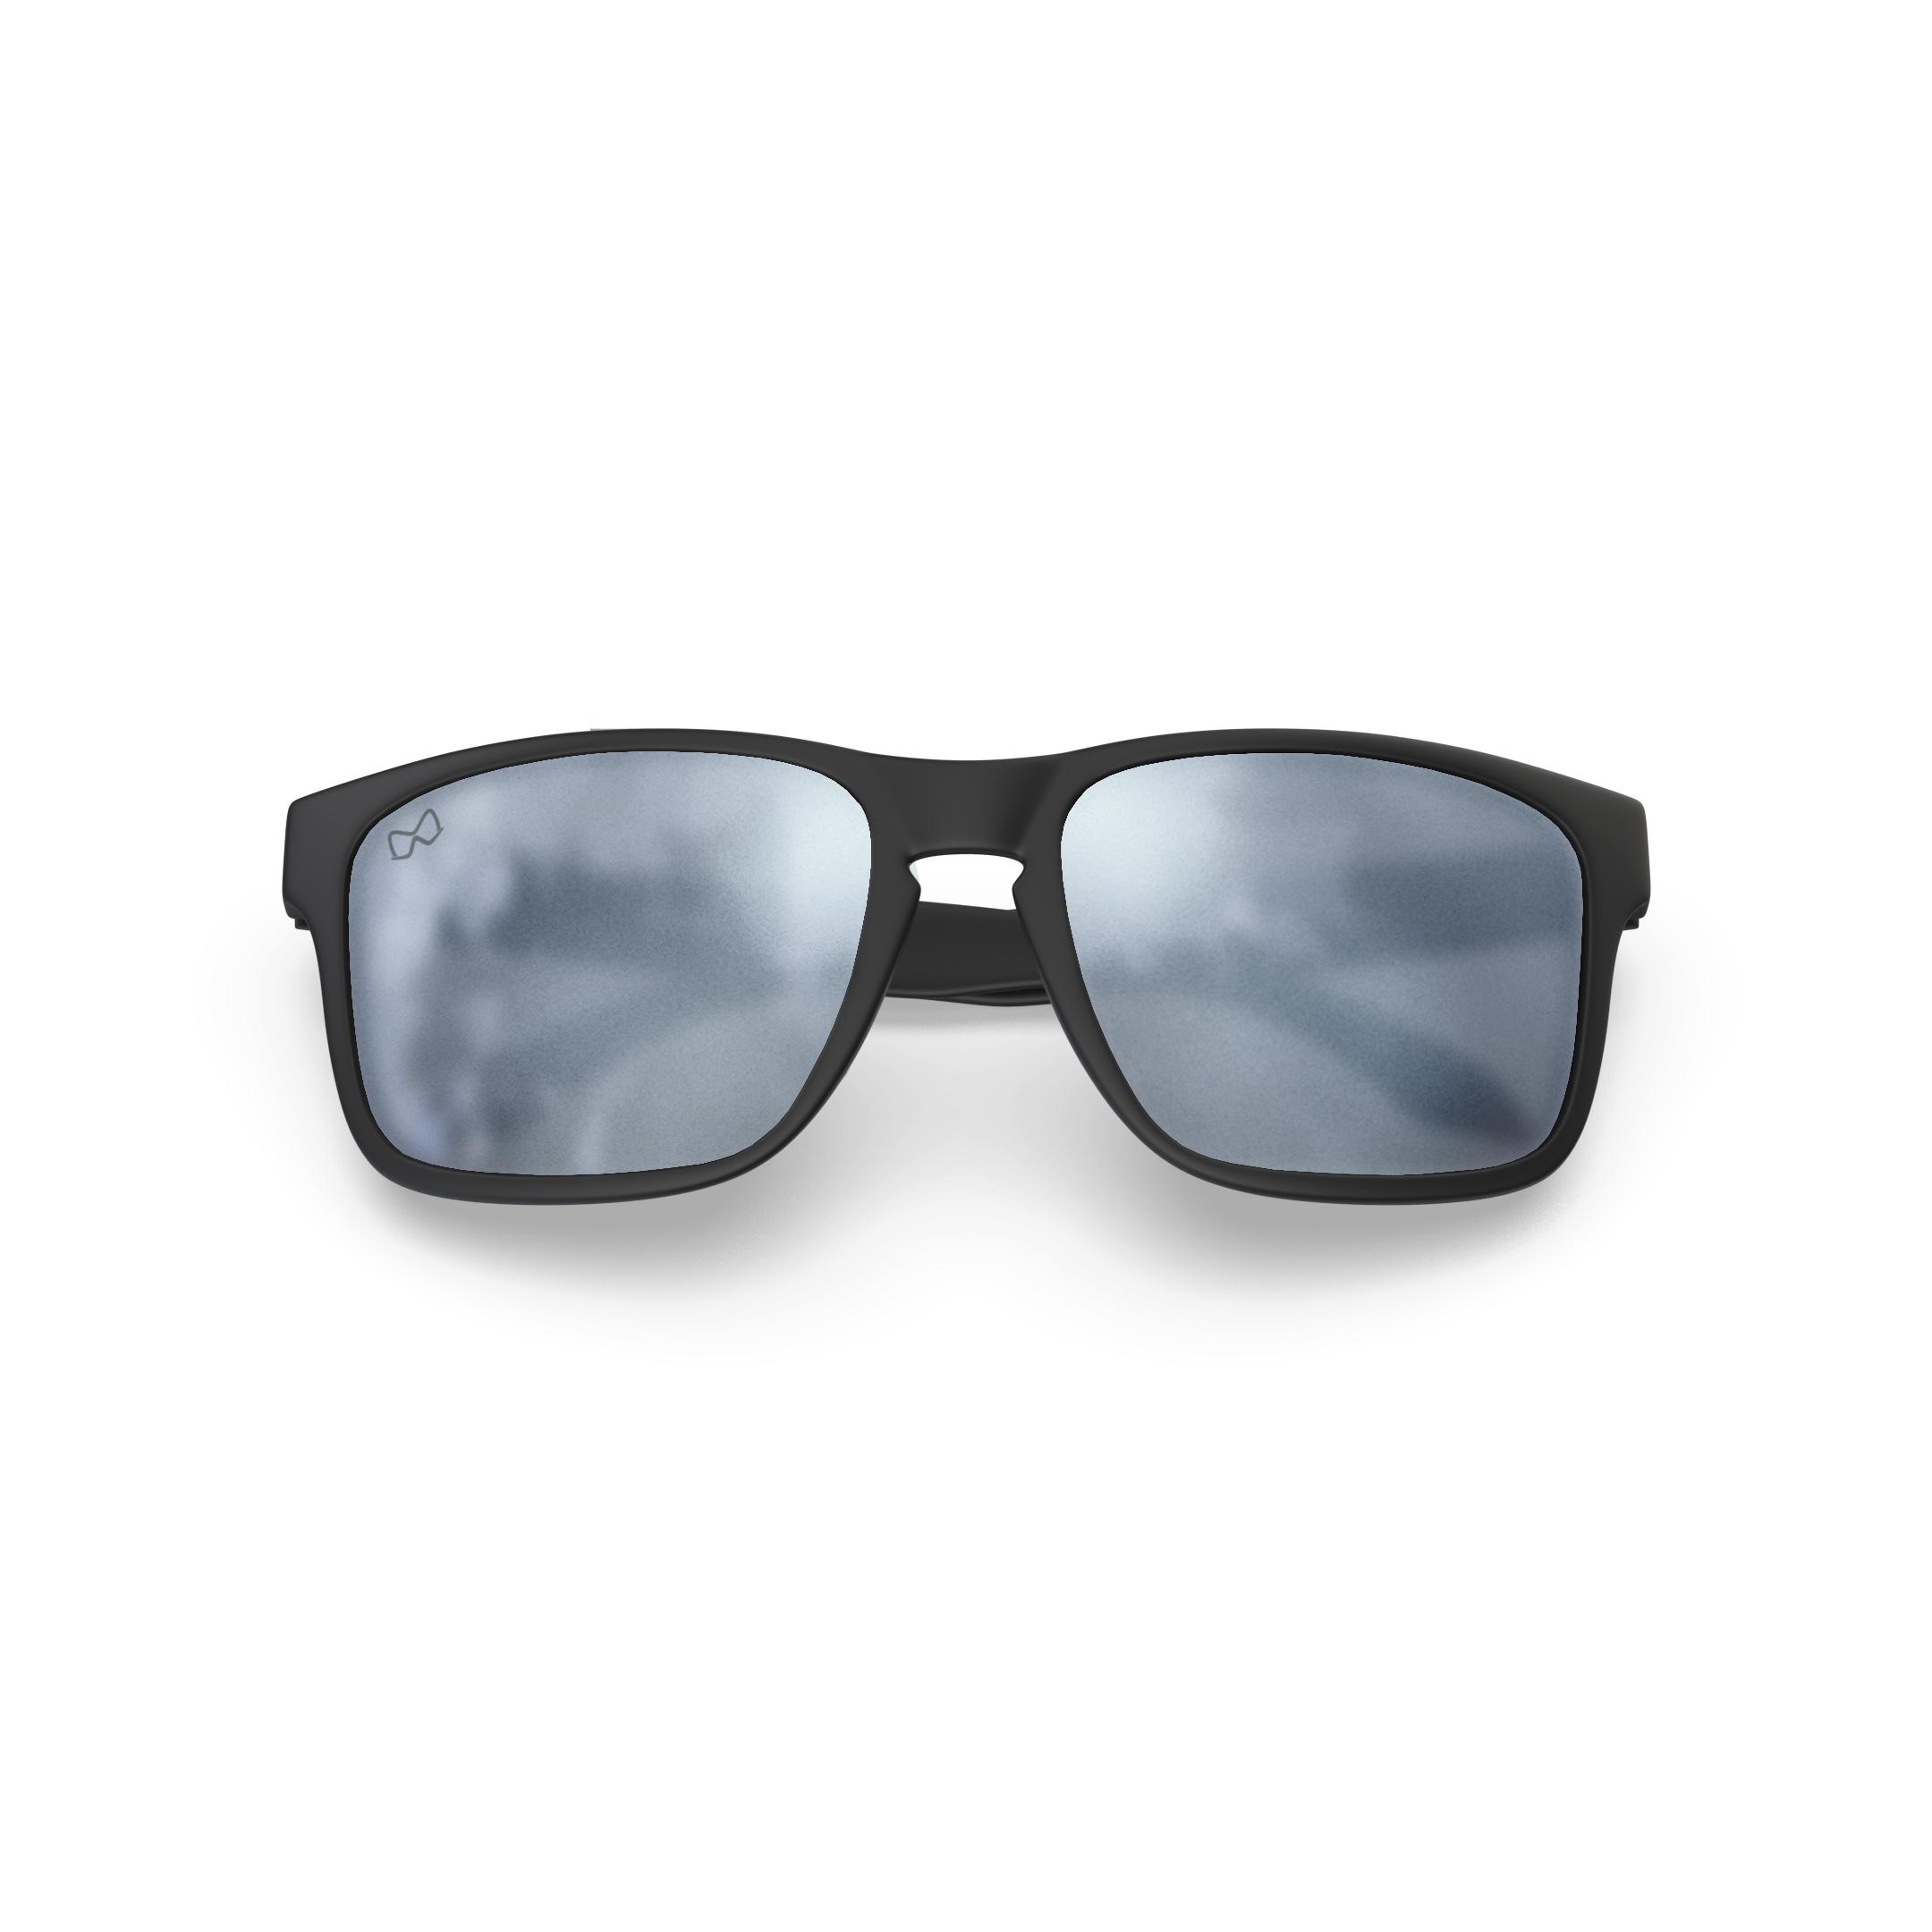 Mariener-Melange-Makan-Matte-Black-Matte-Reflective-Dark-Silver-Adult-Sunglasses-Zonnebril-Mat-Reflecterend-Volwassenen-Folded